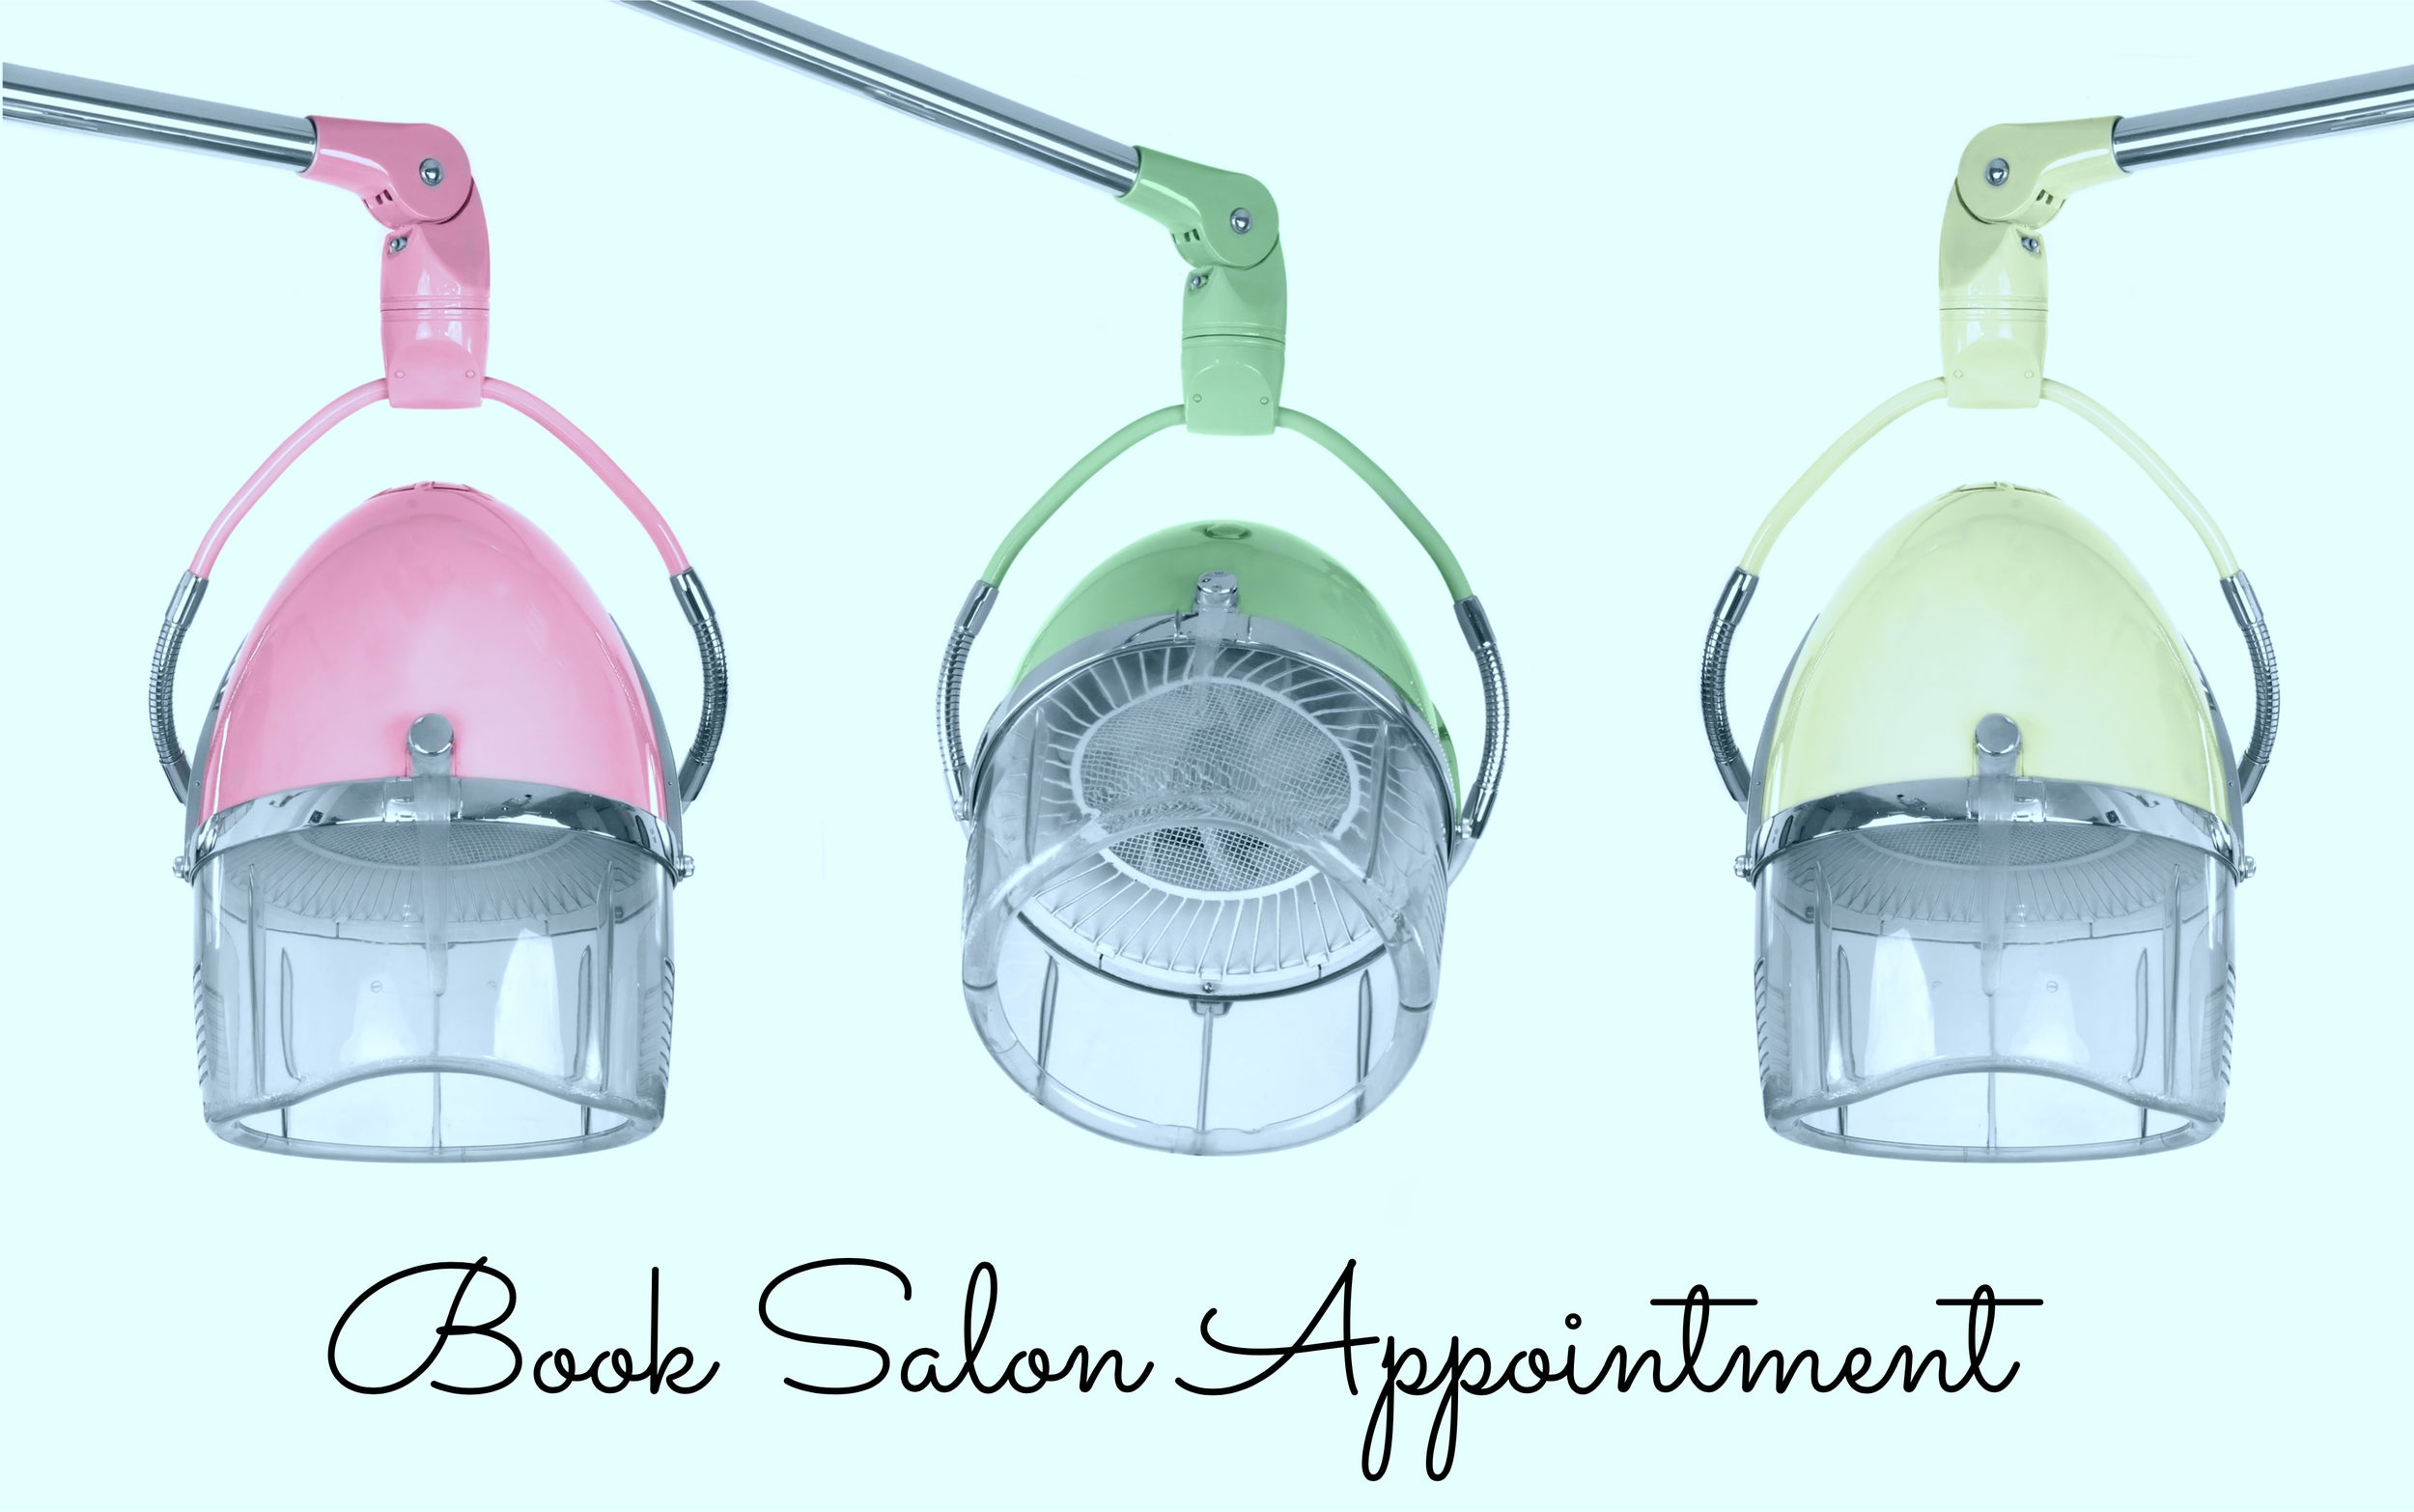 Book Salon Appointment